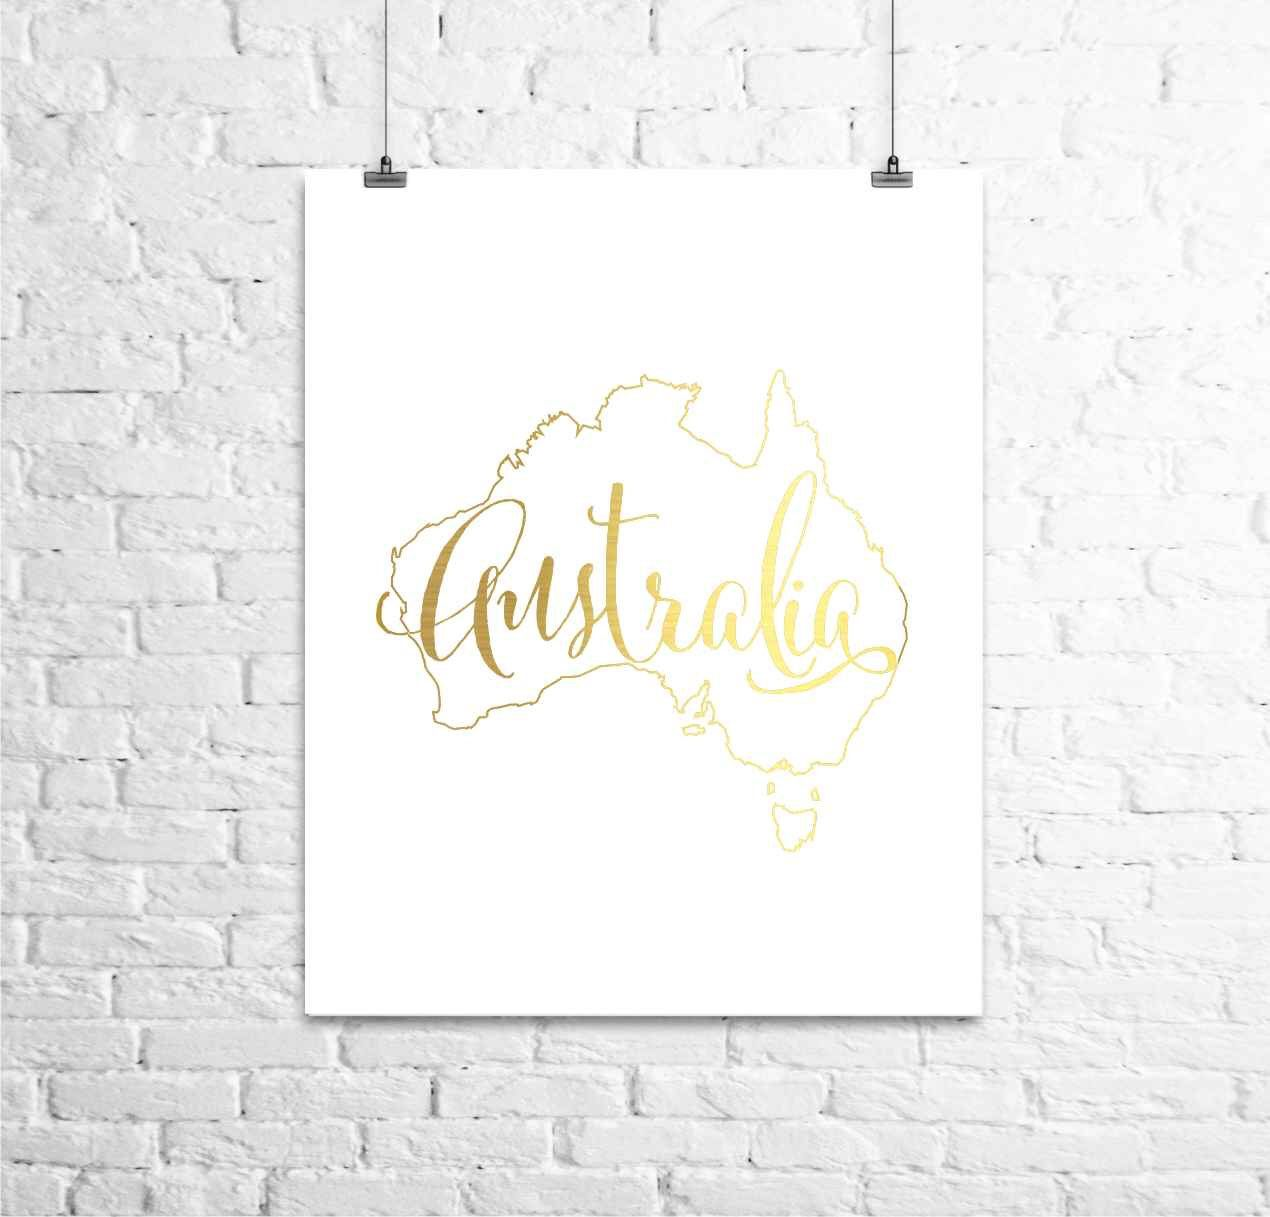 Australia gold map print gold foil print gold foil art print home town